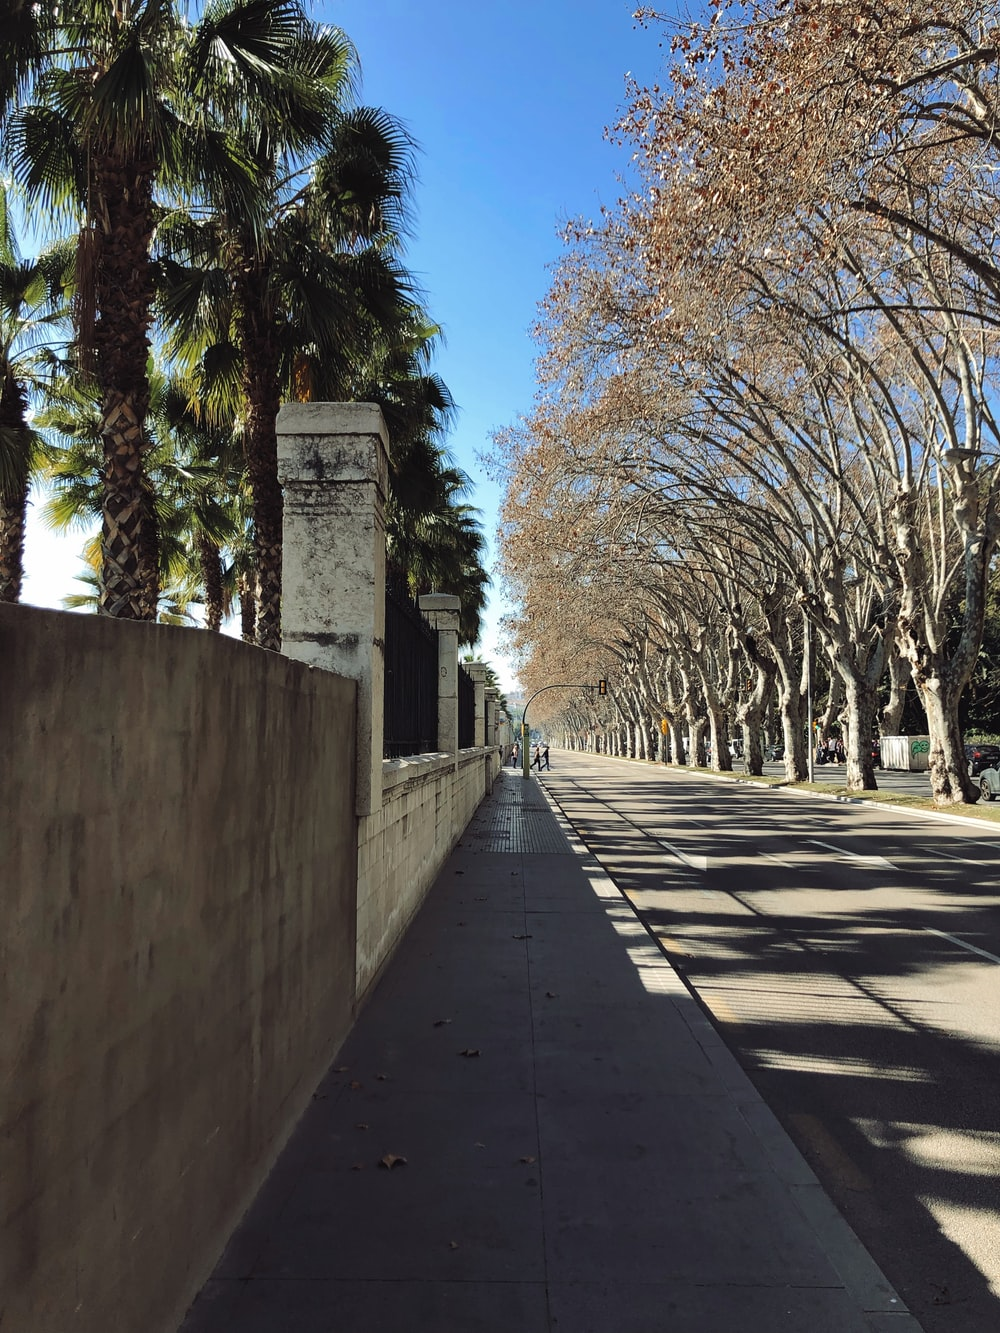 concrete highway near trees